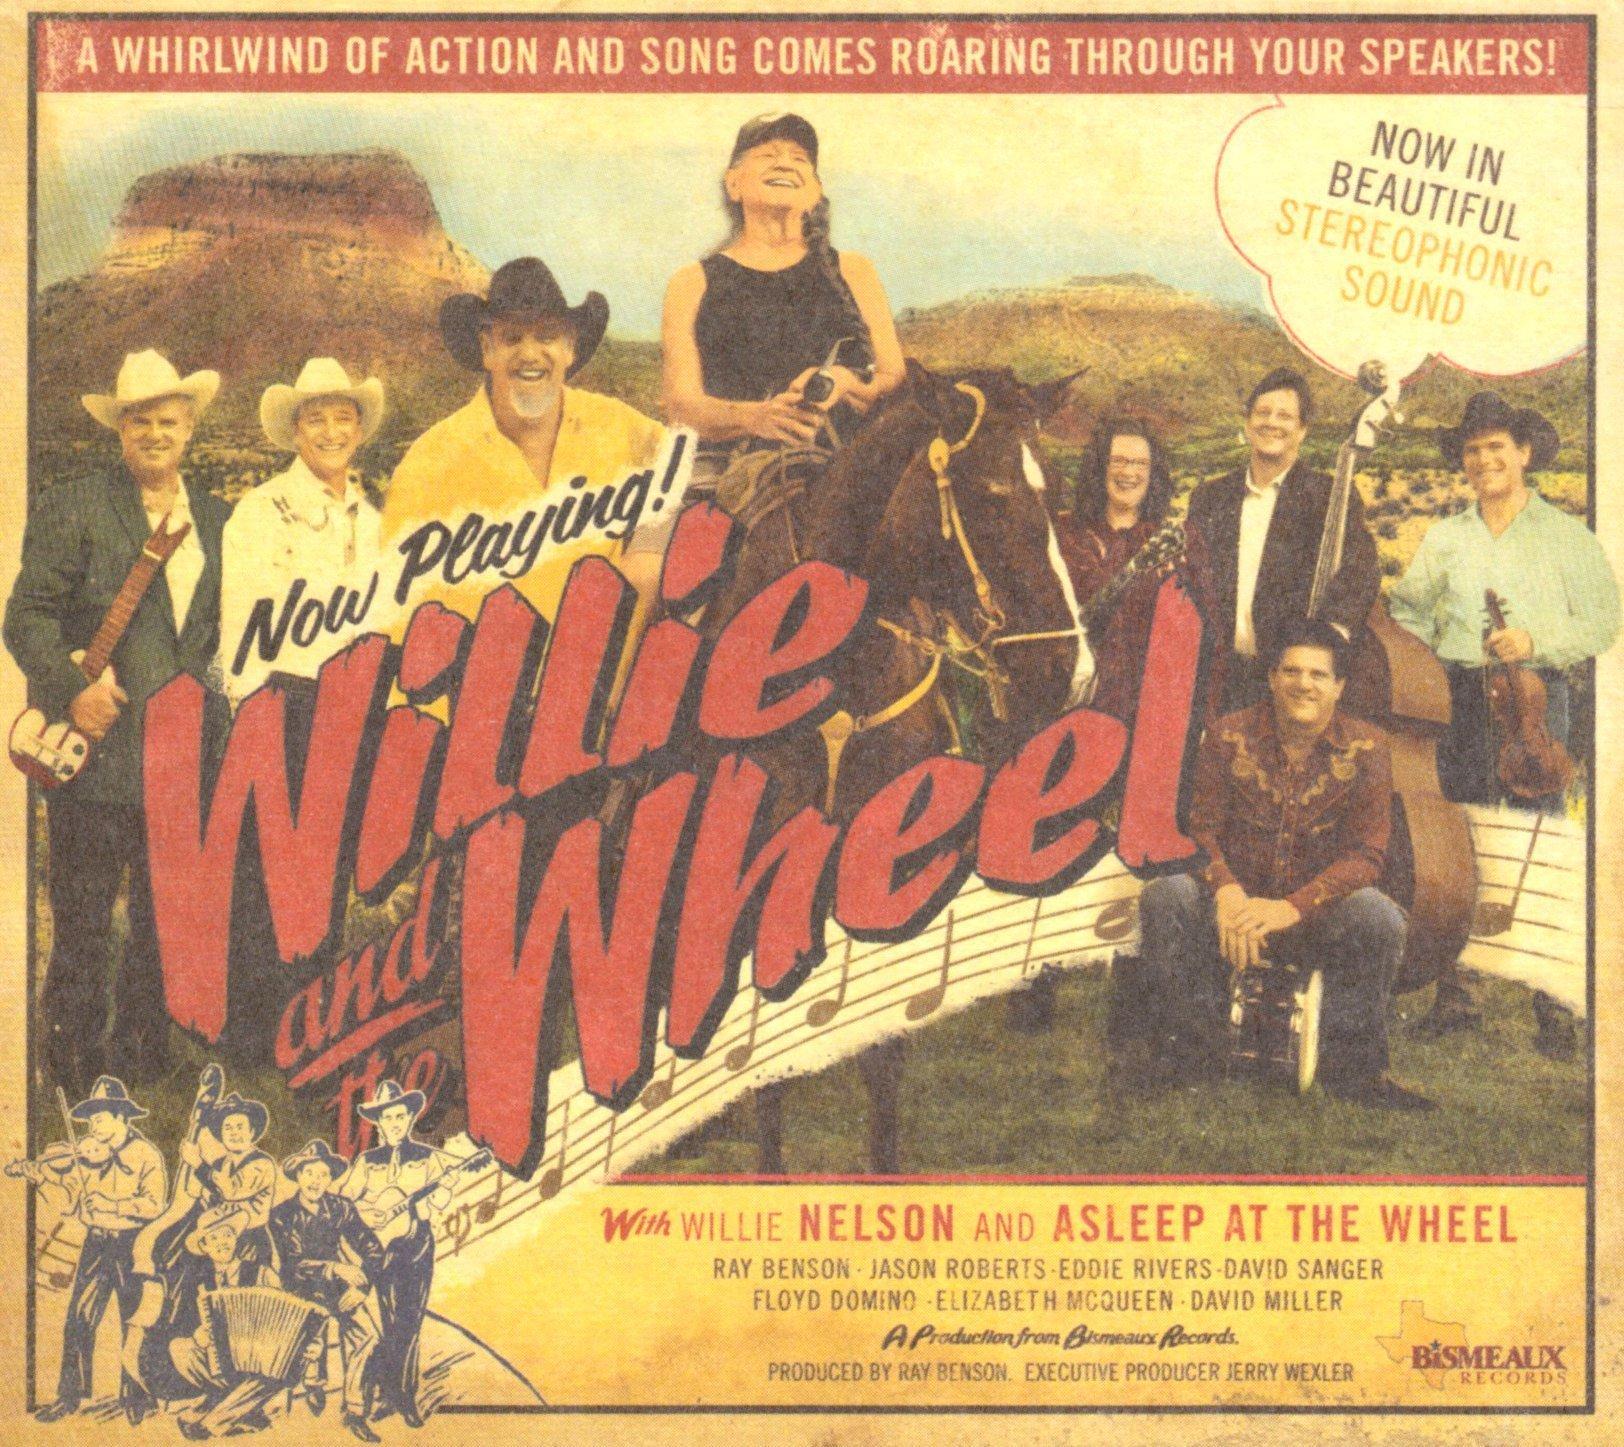 Willie & The Wheel